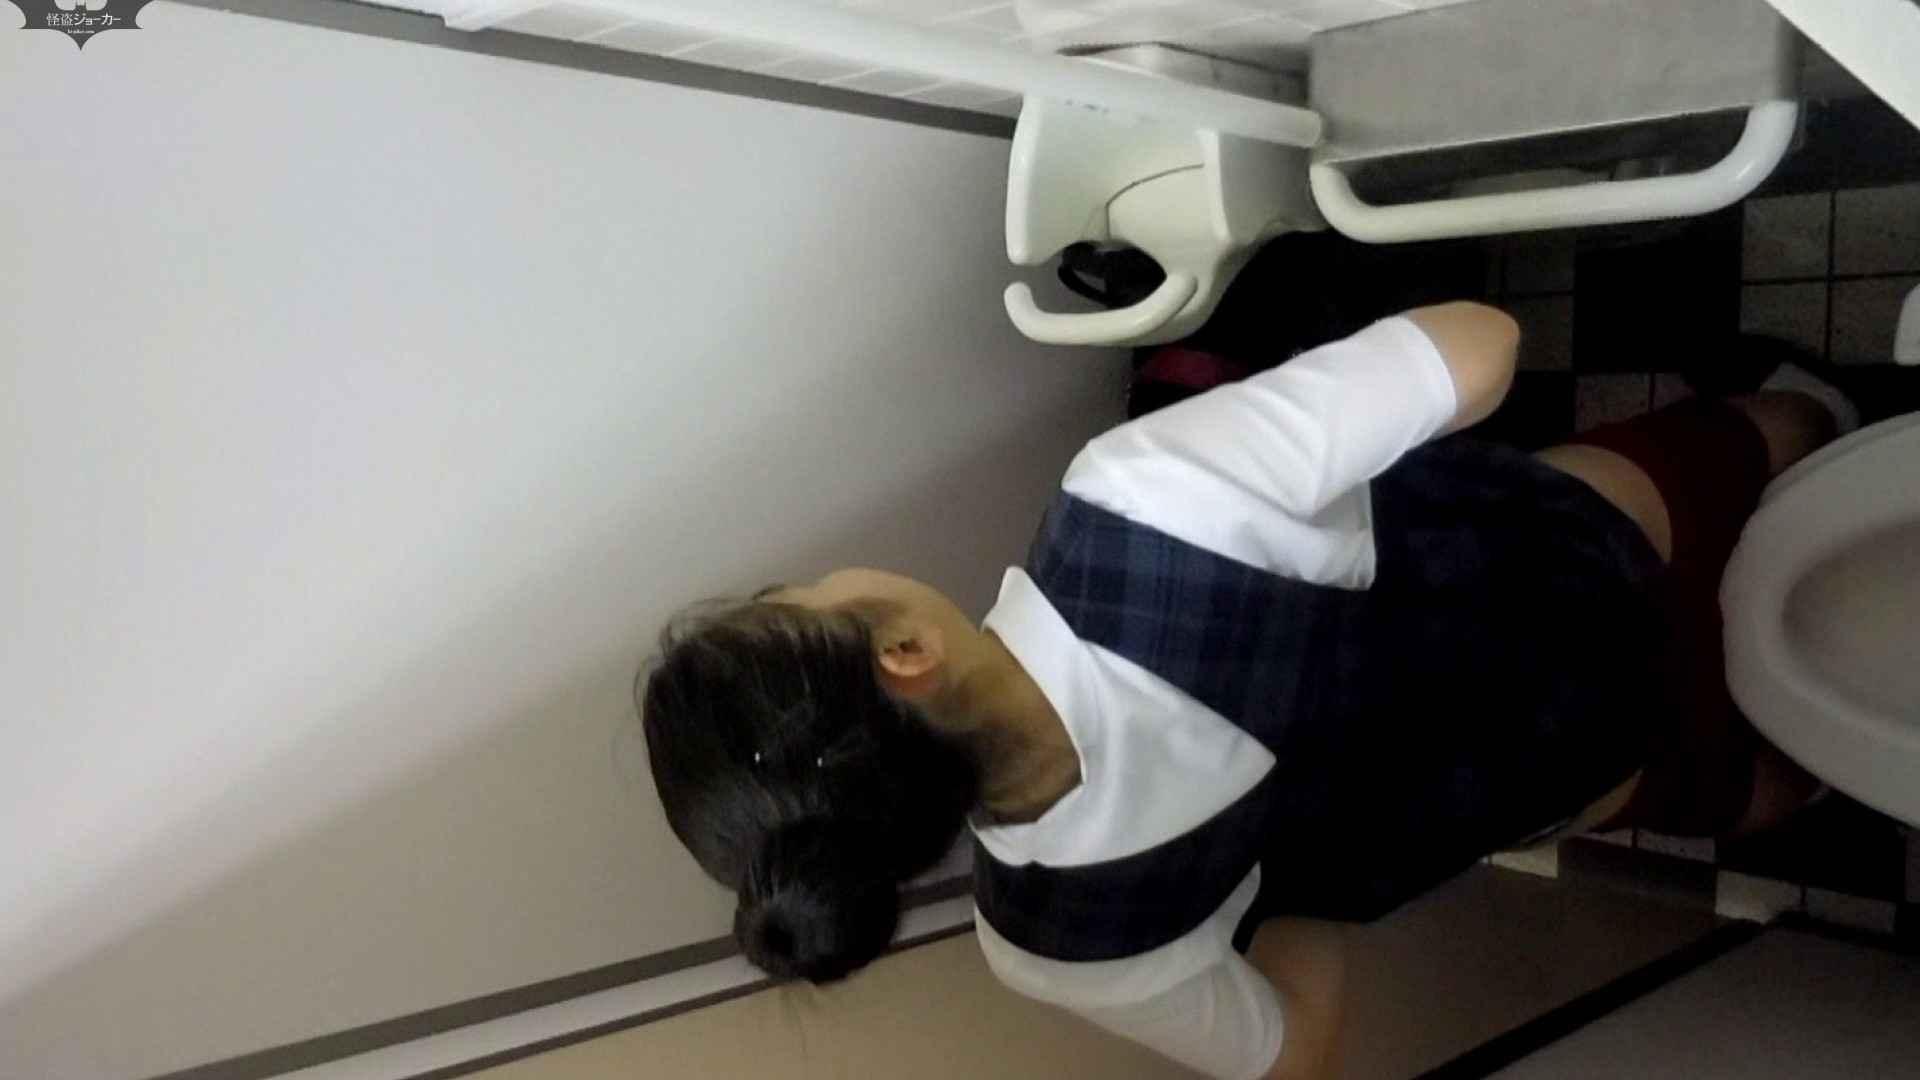 化粧室絵巻 駅舎編 VOL.24 パンツ特集 ワレメ無修正動画無料 83画像 22